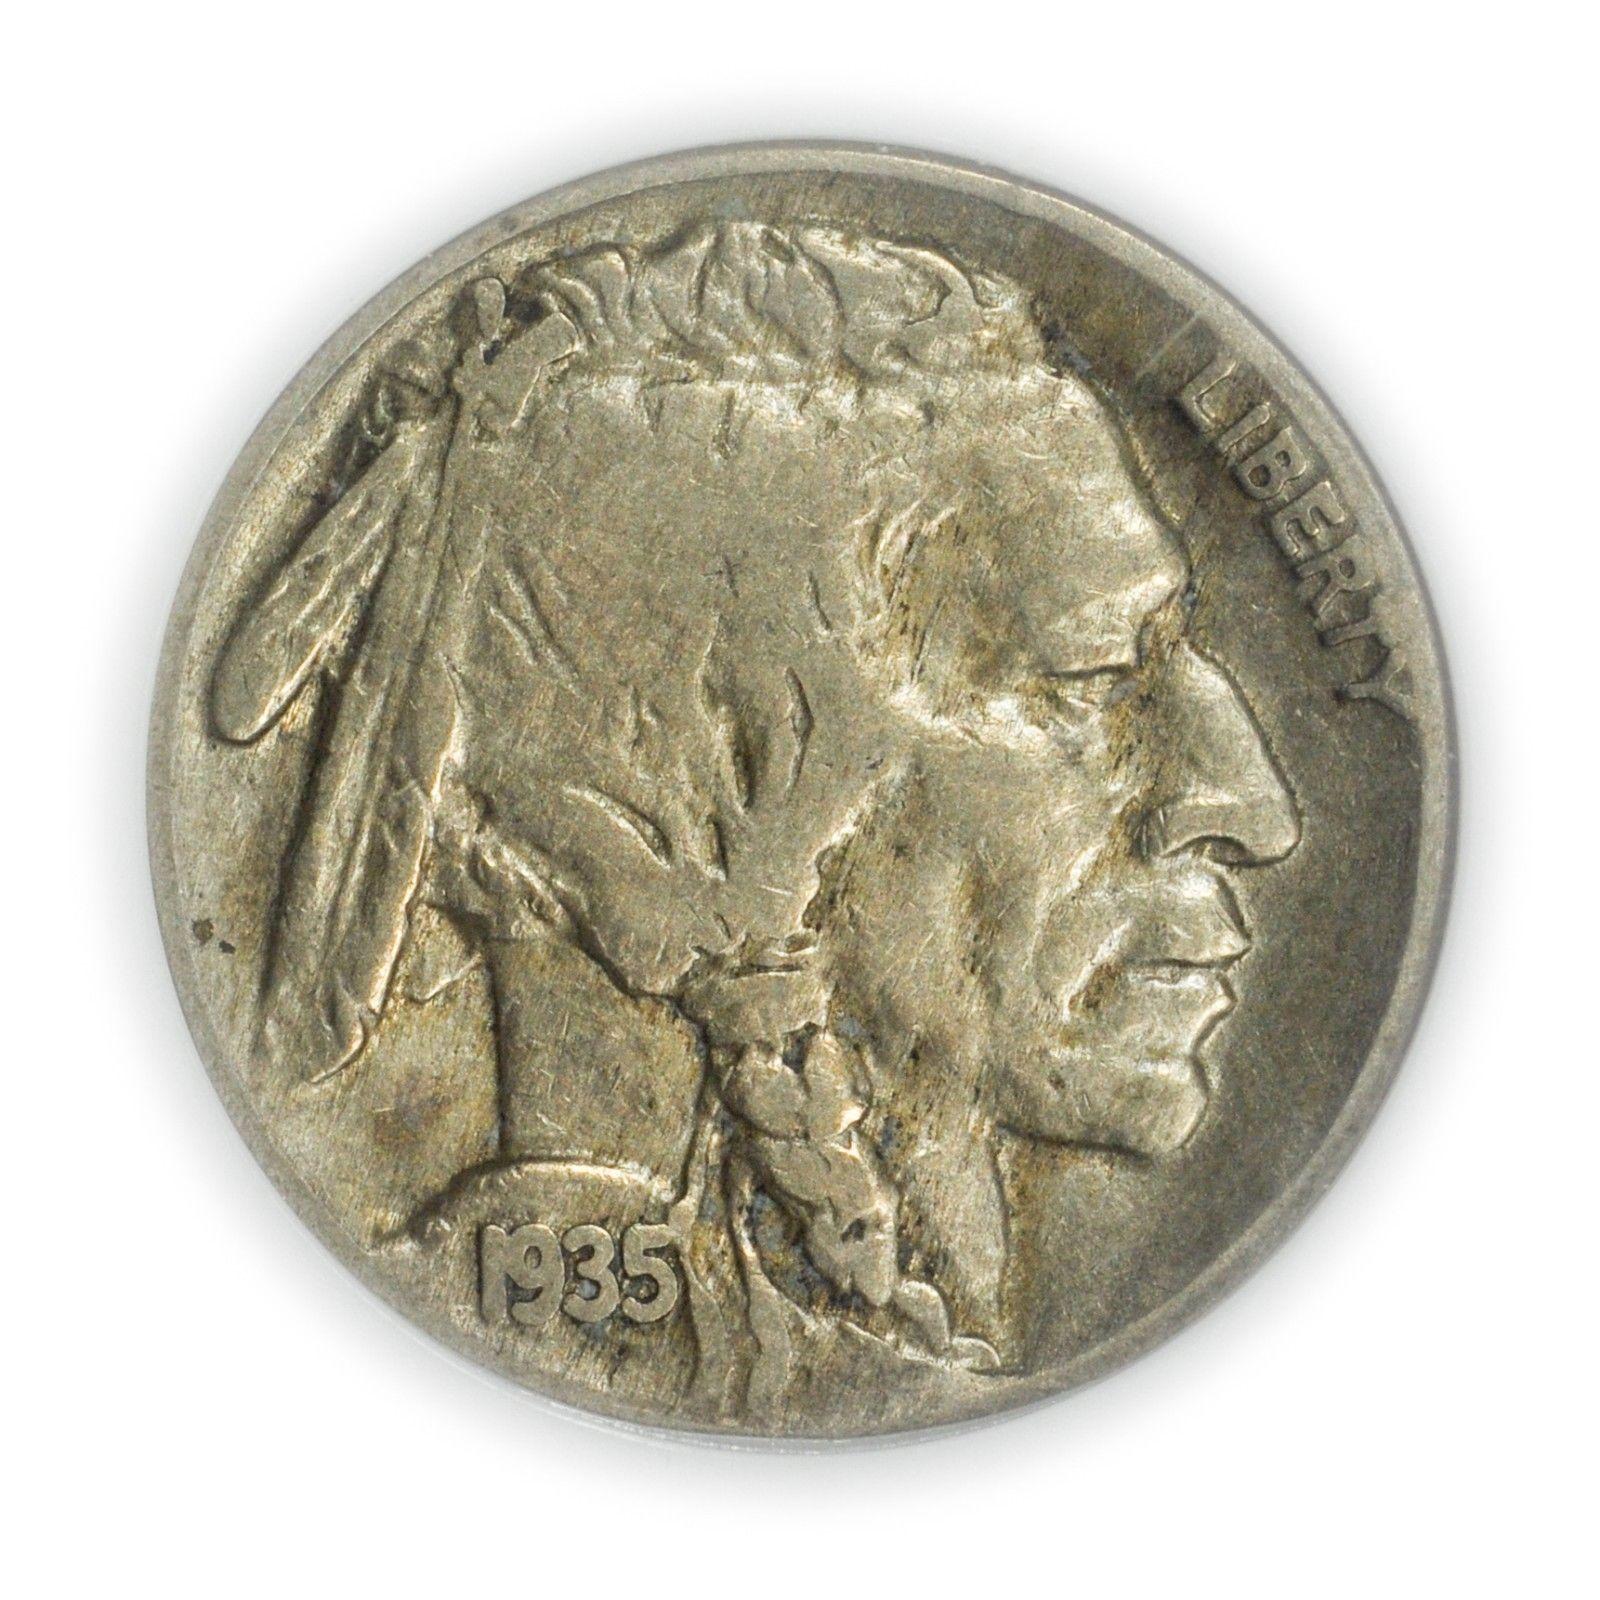 1935 Buffalo Nickel Graded PCGS F12